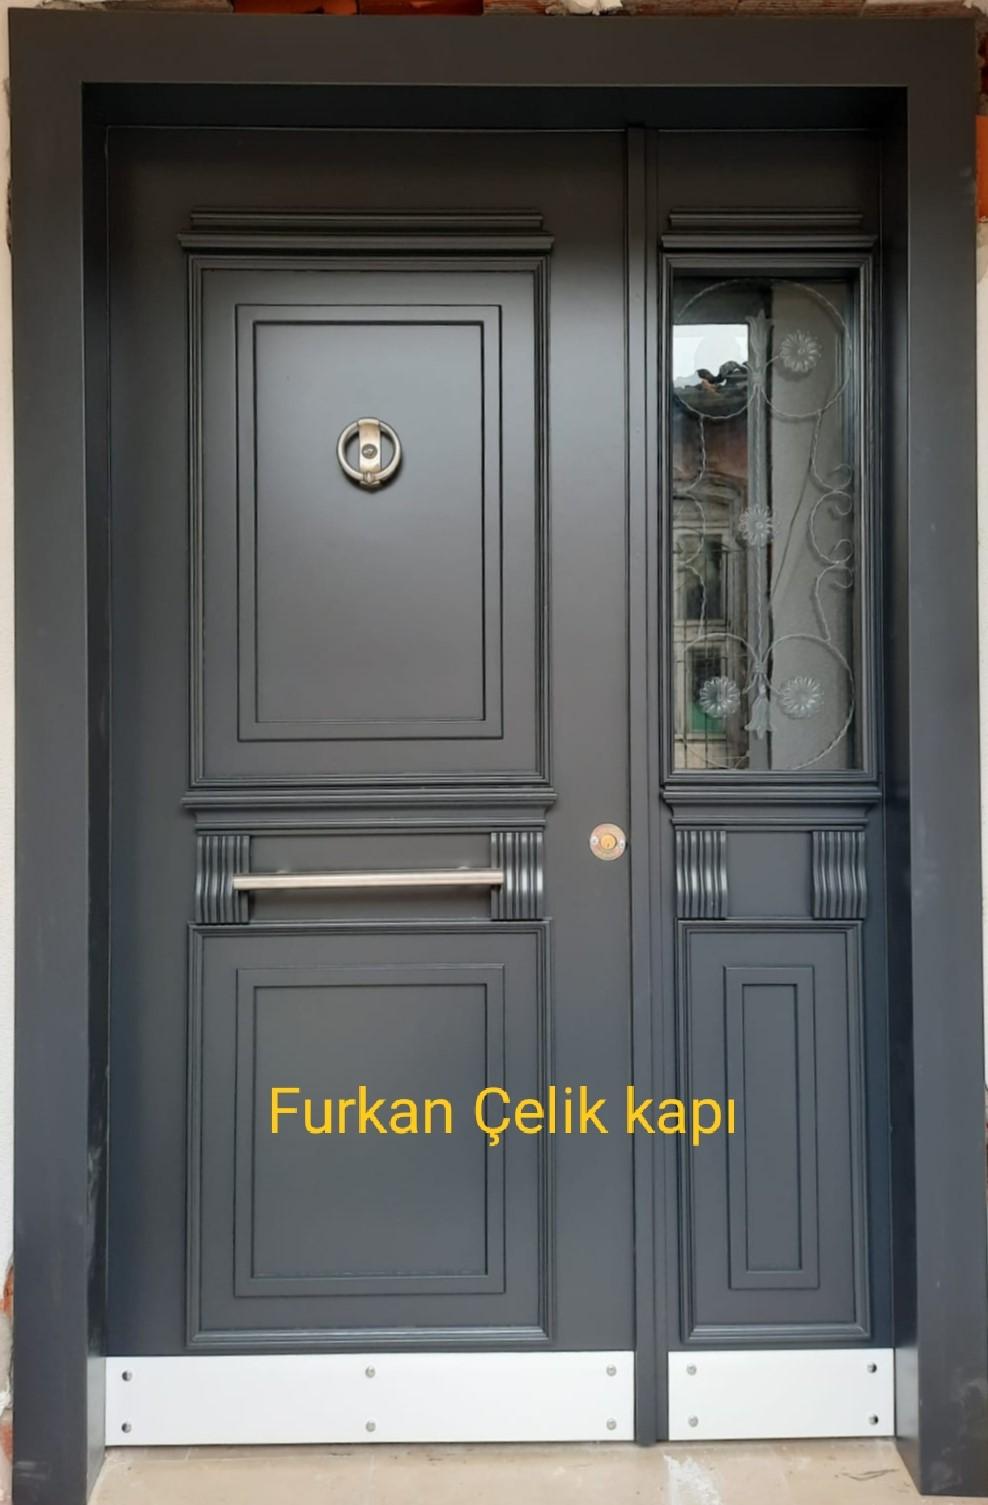 F 52 apartman dış kapısı